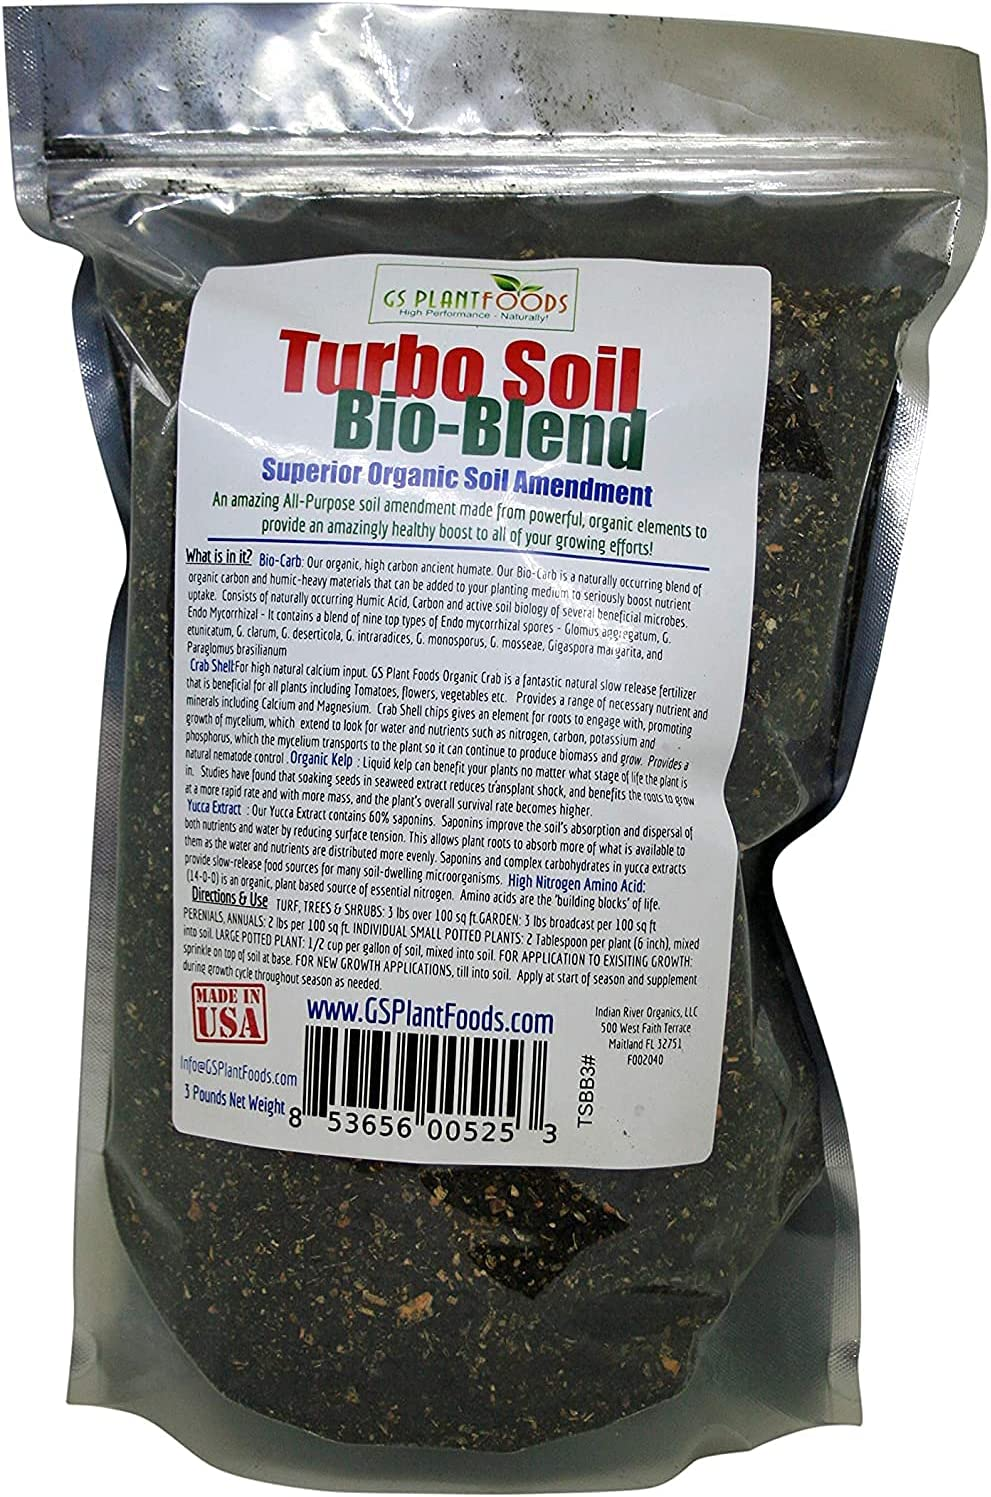 Max 57% OFF Turbo Soil Bio-Blend - Superior Organic Amendment Humi NEW before selling ☆ with